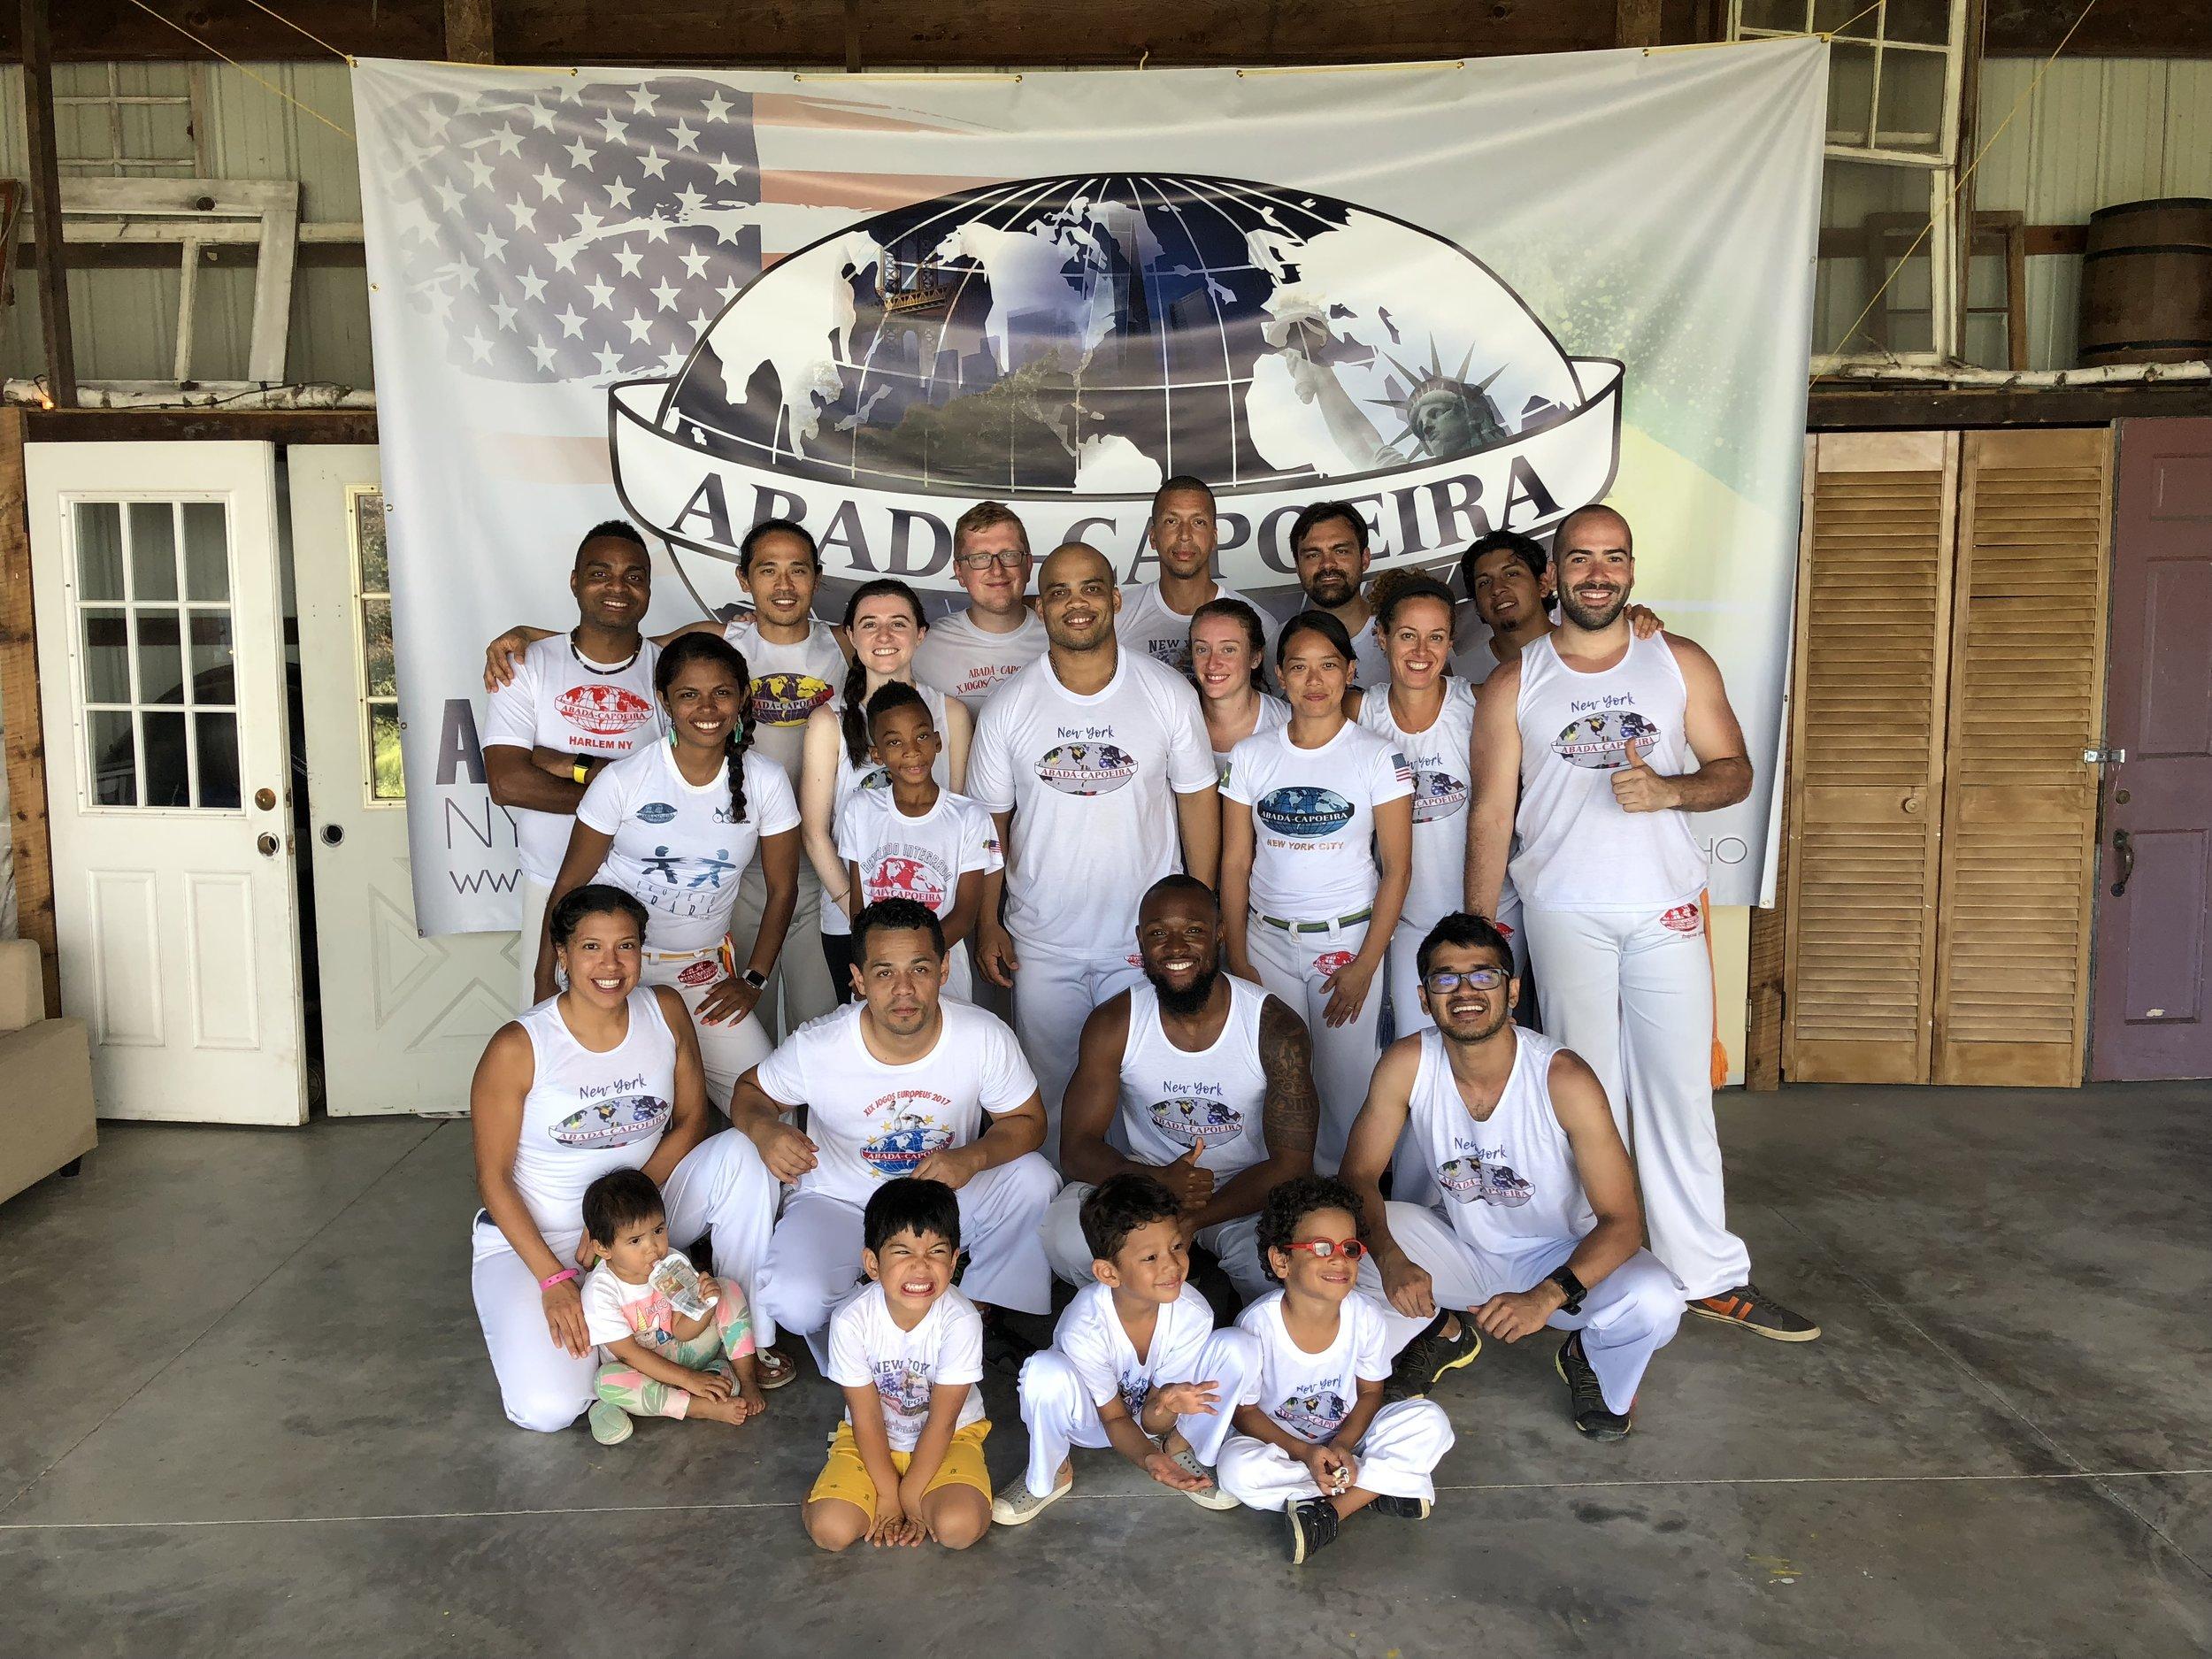 ACA upstate Capoeira.jpeg